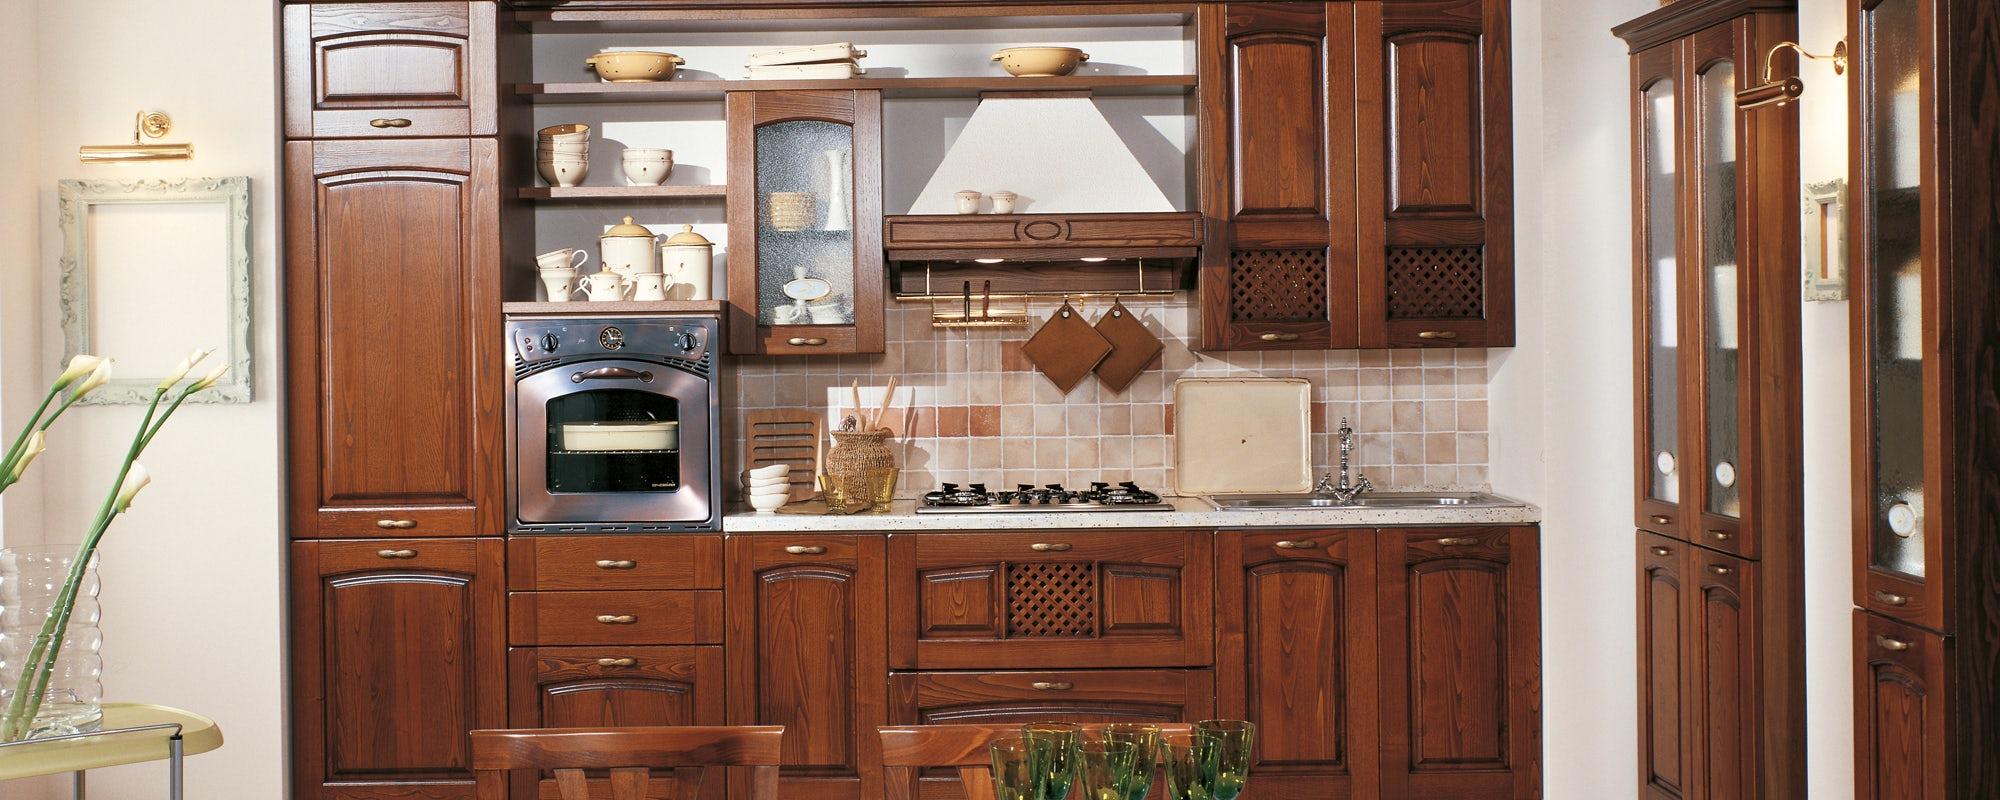 Cucine Stosa Prezzi 2018 cucina focolare